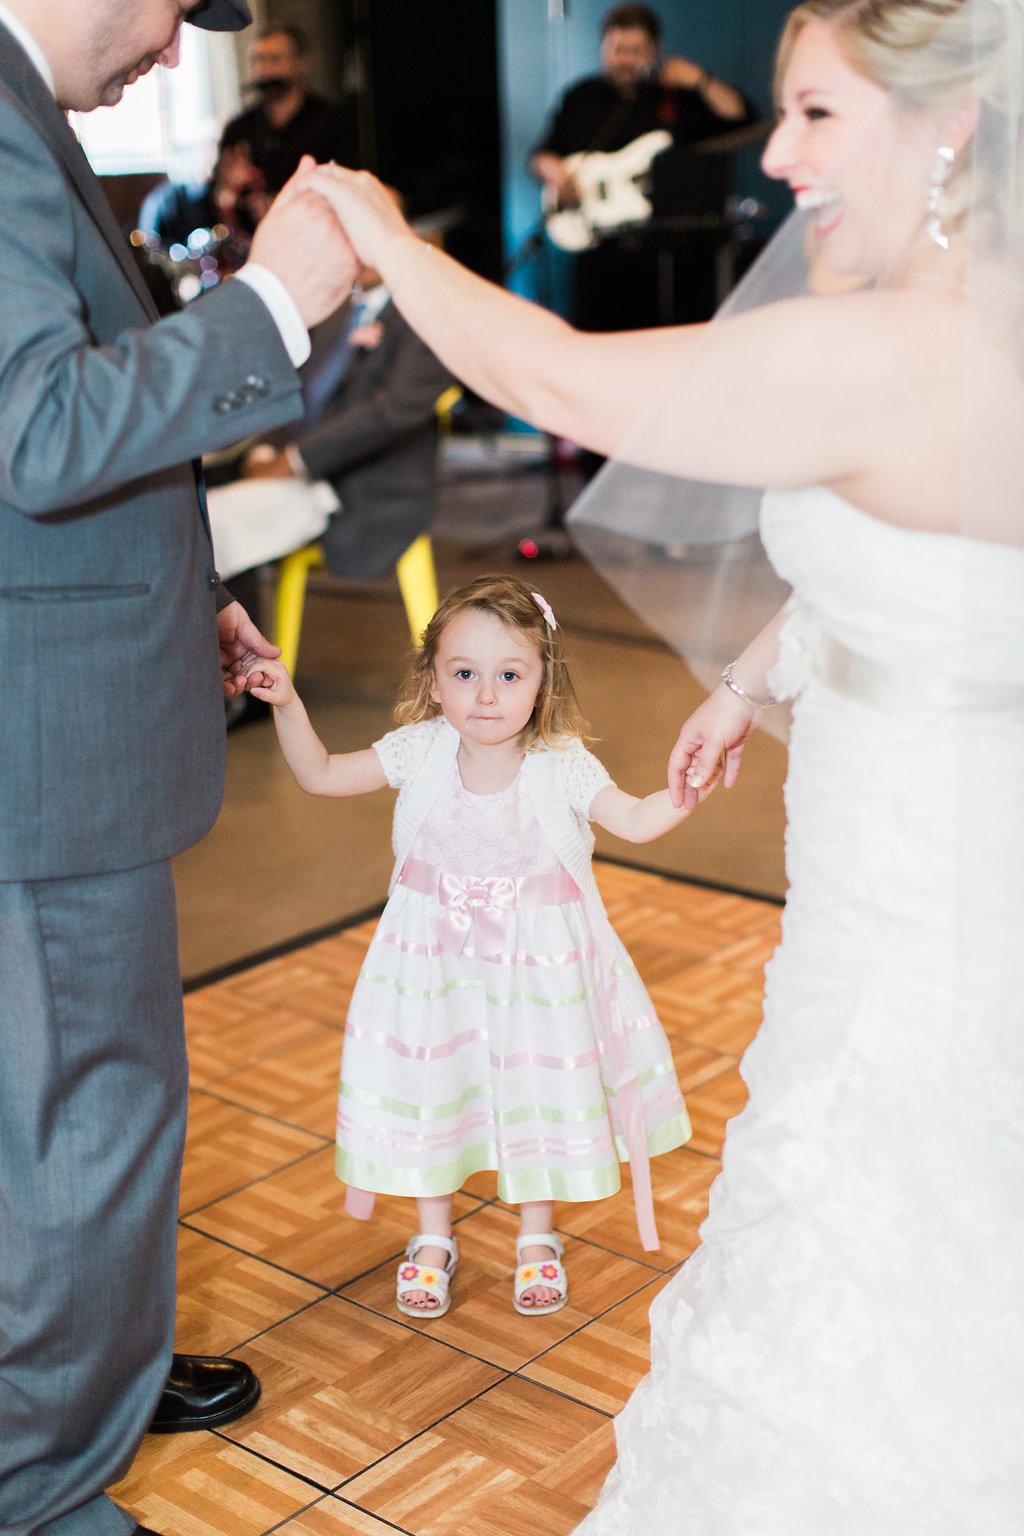 kristin-and-darren-wedding-soho-south-cafe-wormsloe-apt-b-photography-savannah-wedding-planner-savannah-weddings-southern-weddings-best-savannah-wedding-planner-33.JPG